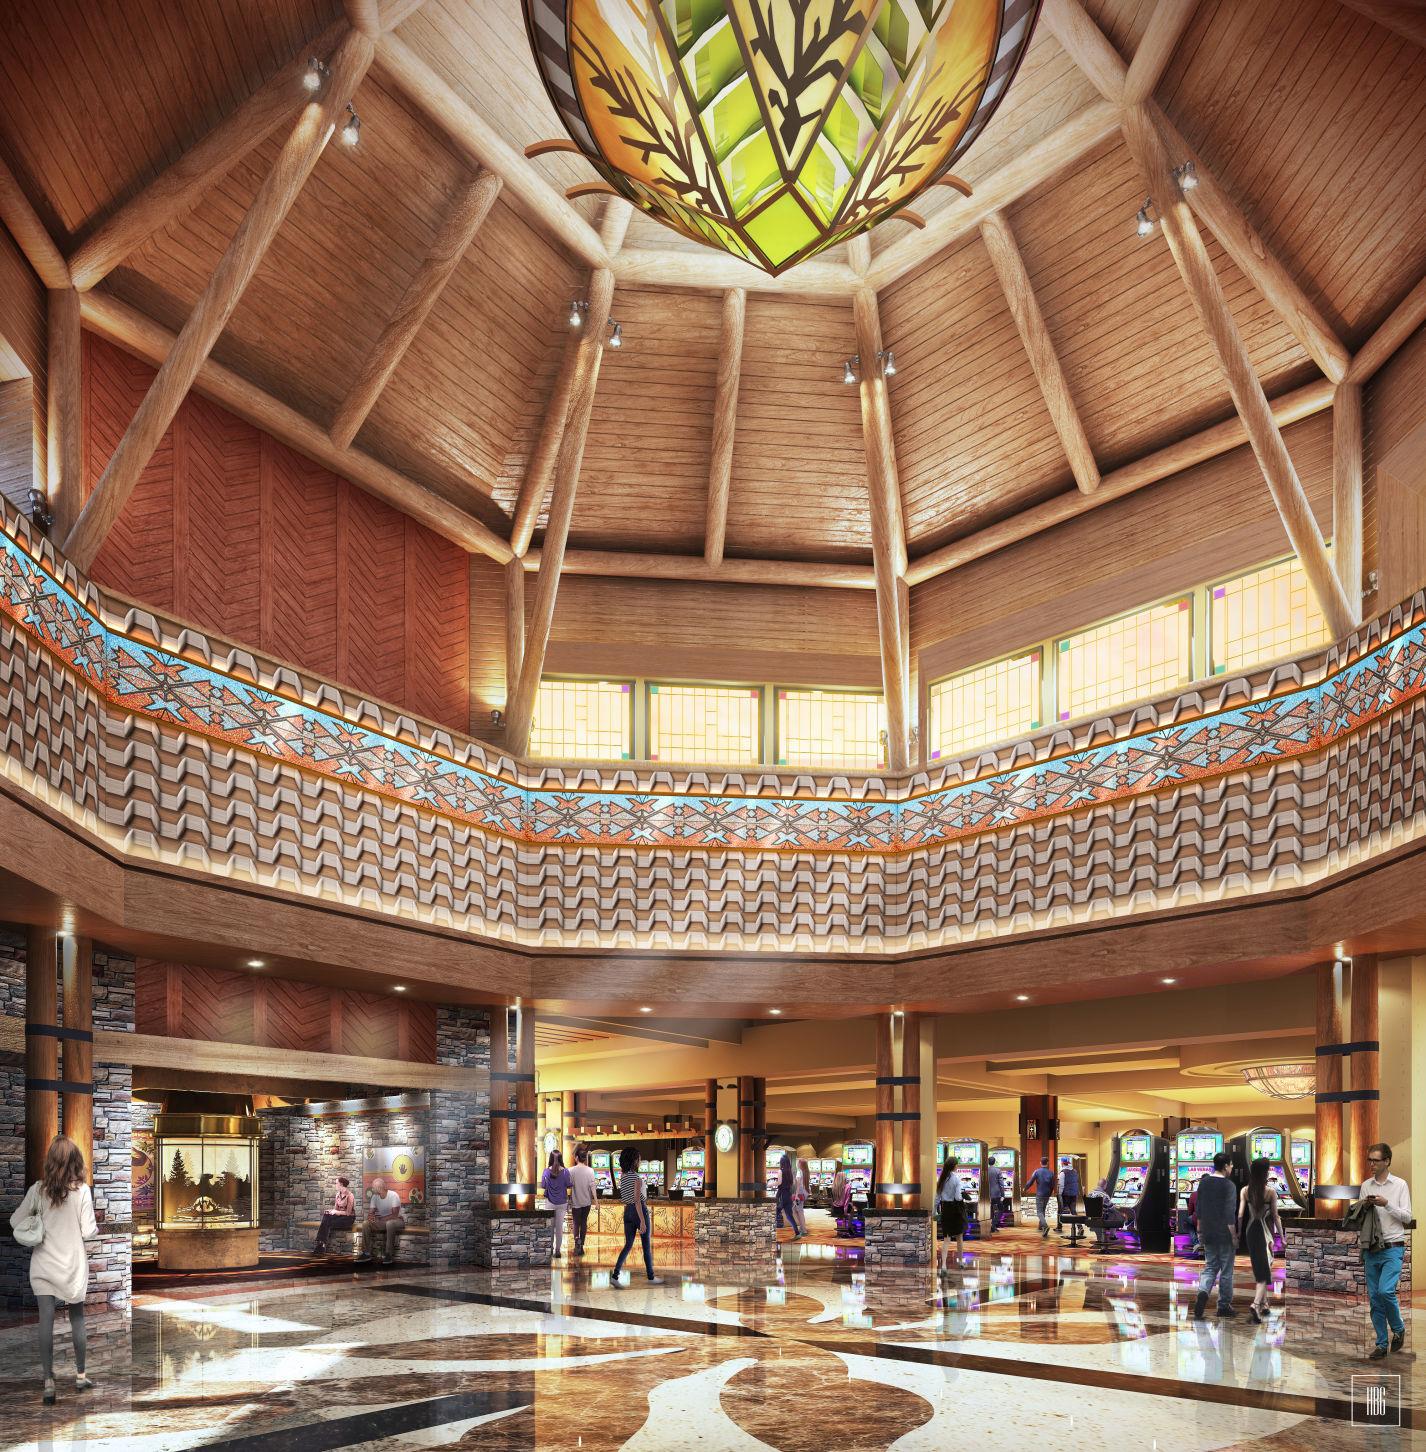 Winds casino indiana effectiveness of responsible gambling